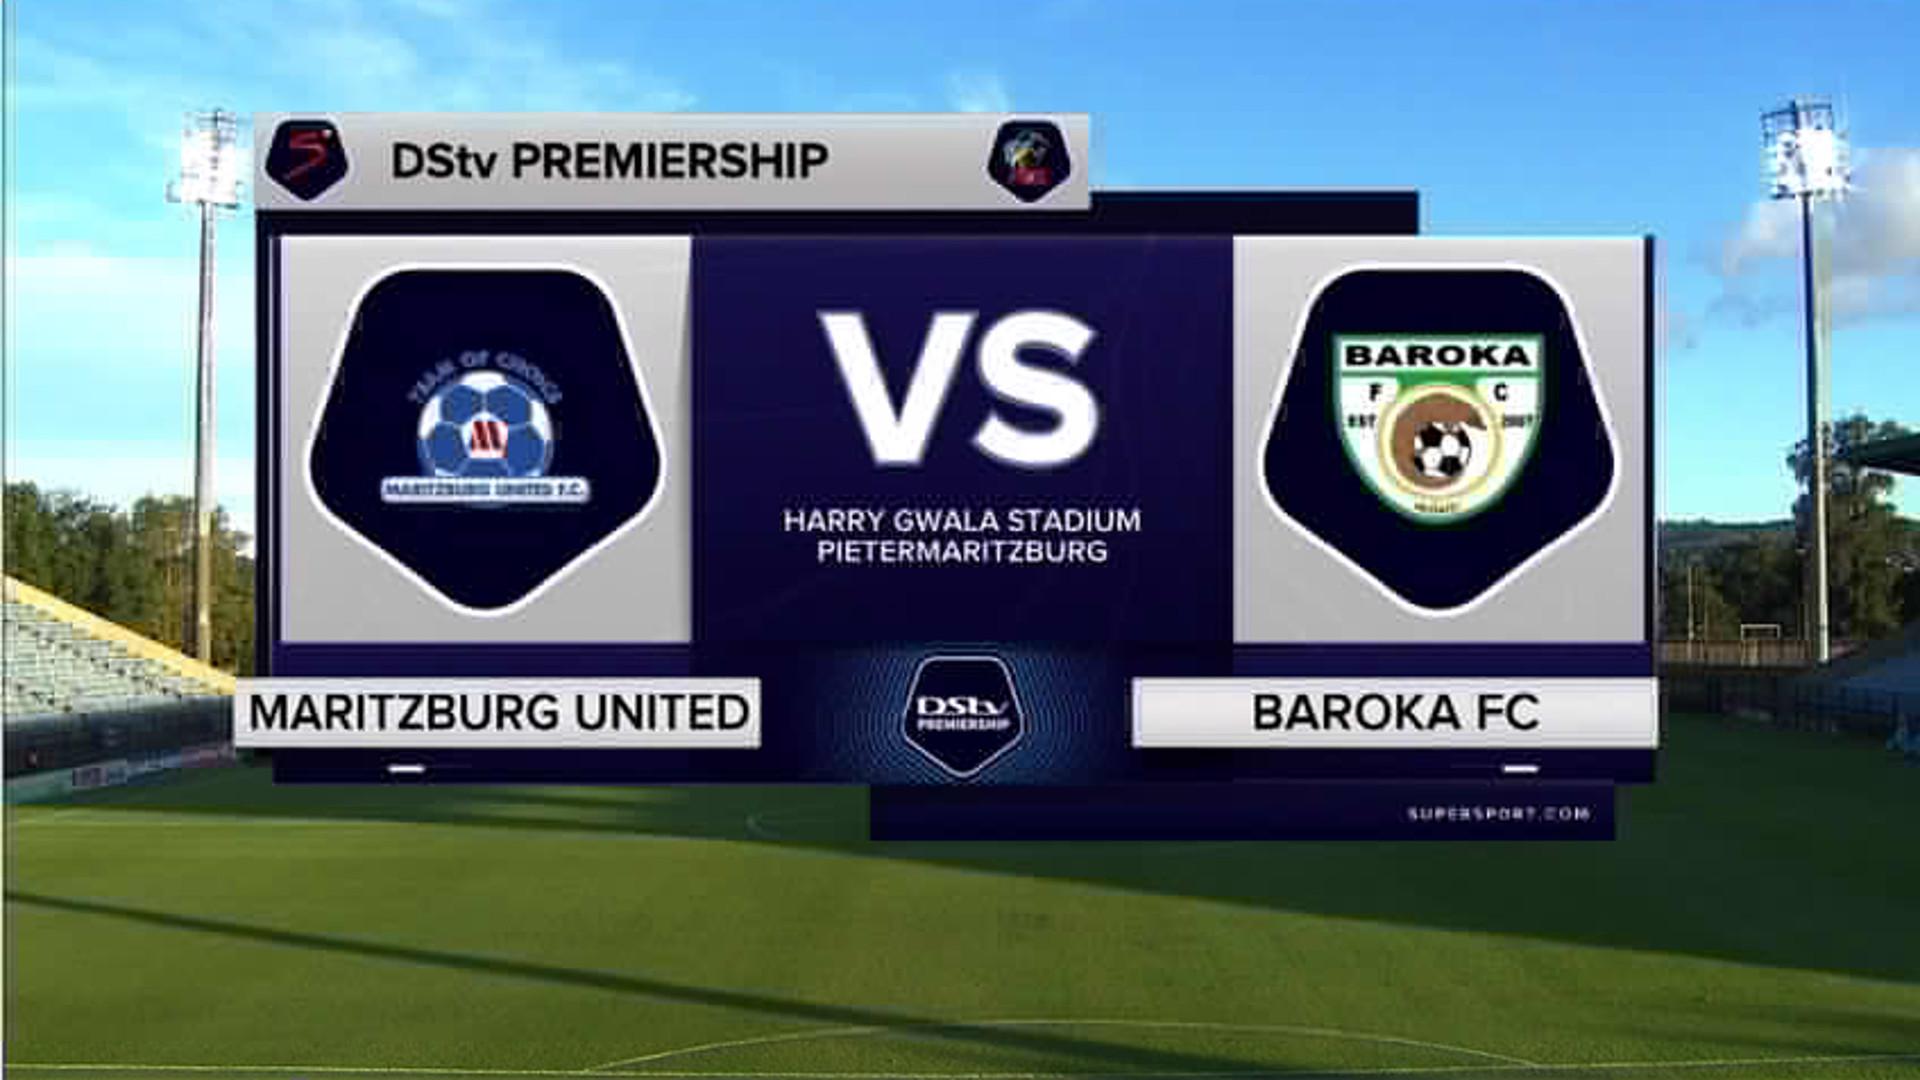 DStv Premiership | Maritzburg United v Baroka FC | Highlights